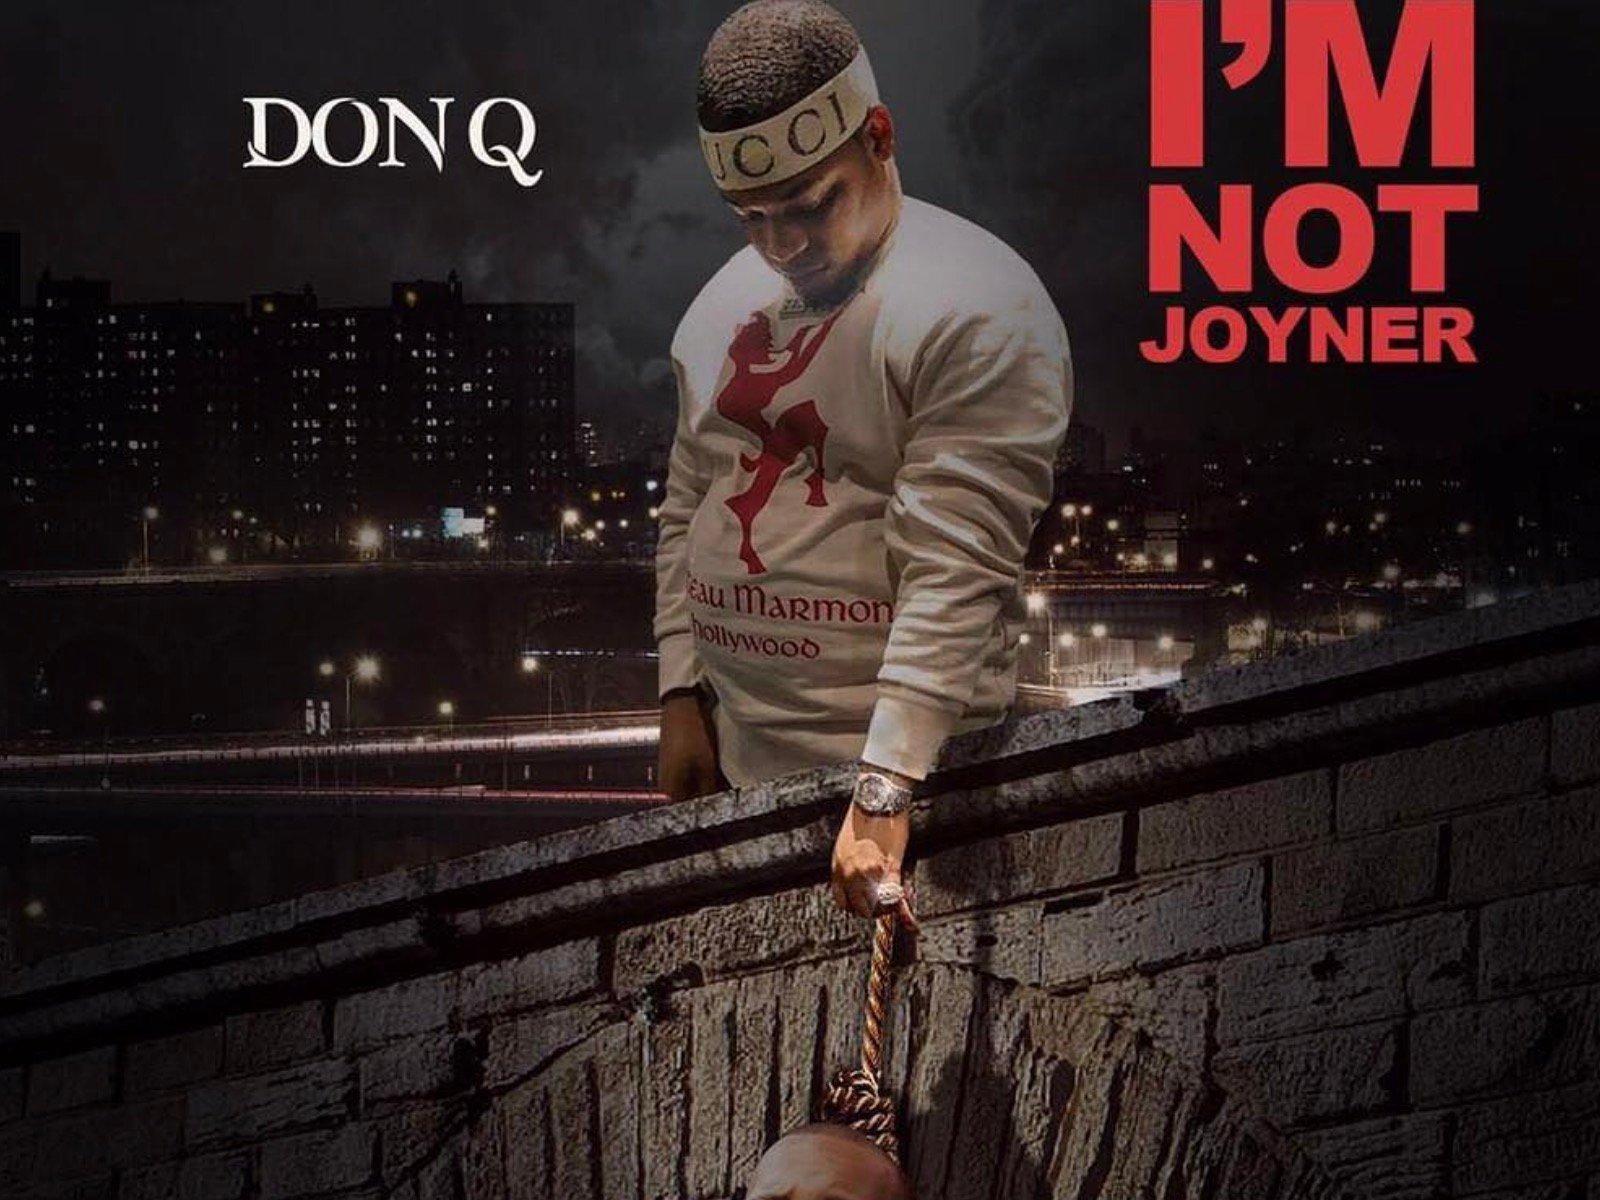 Don Q I'm Not Joyner